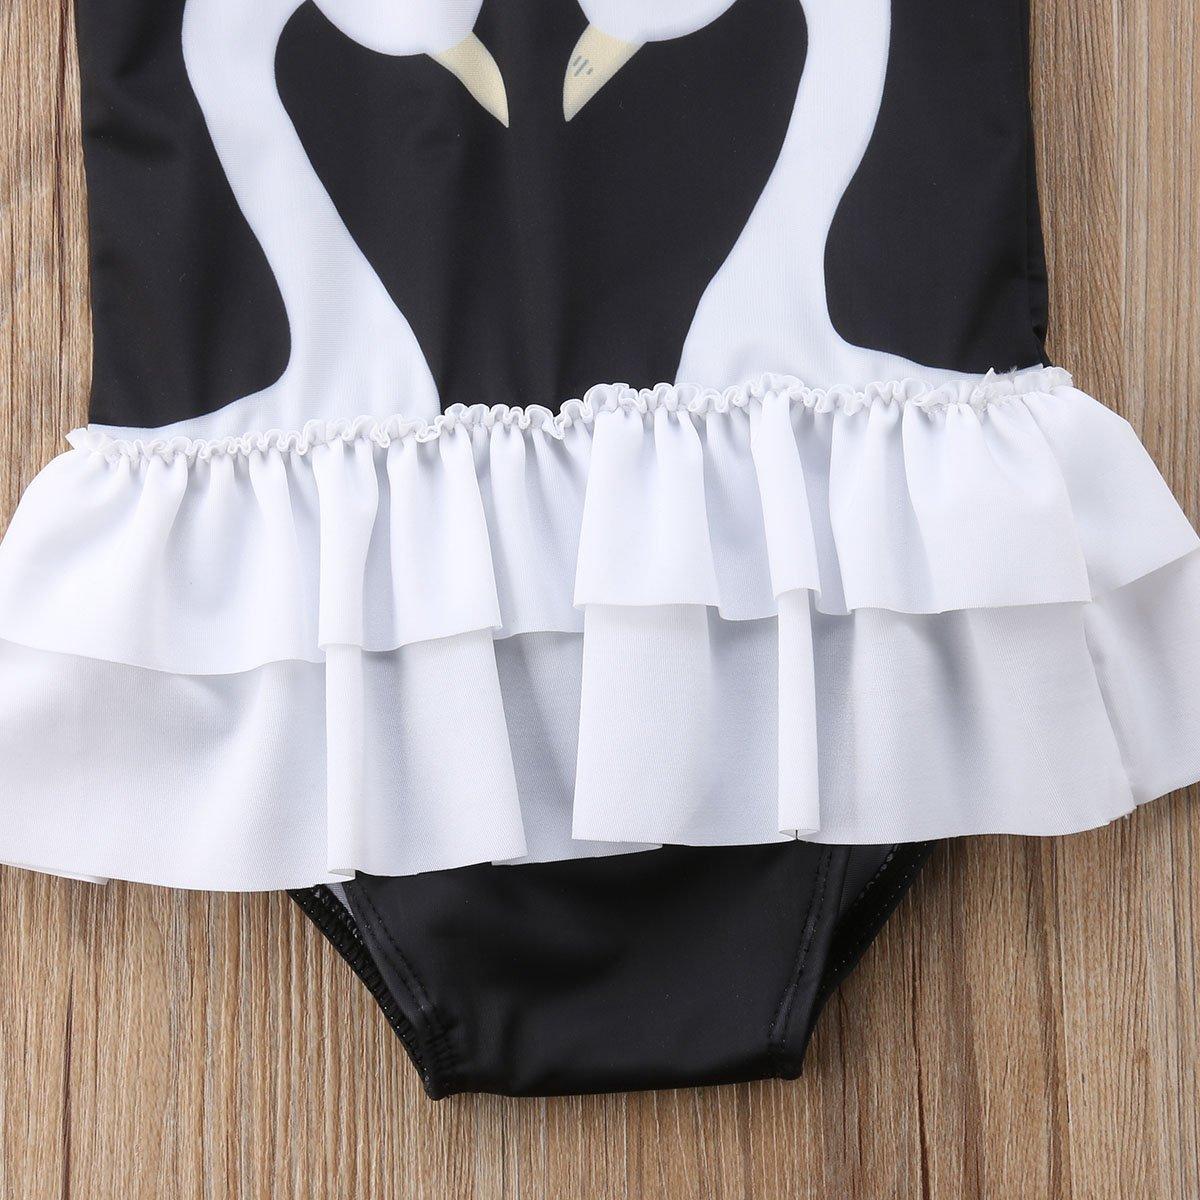 Toddler Baby Girl Swan Print Ruffle Hem Swimsuit One Piece Bathing Suit Beachwear